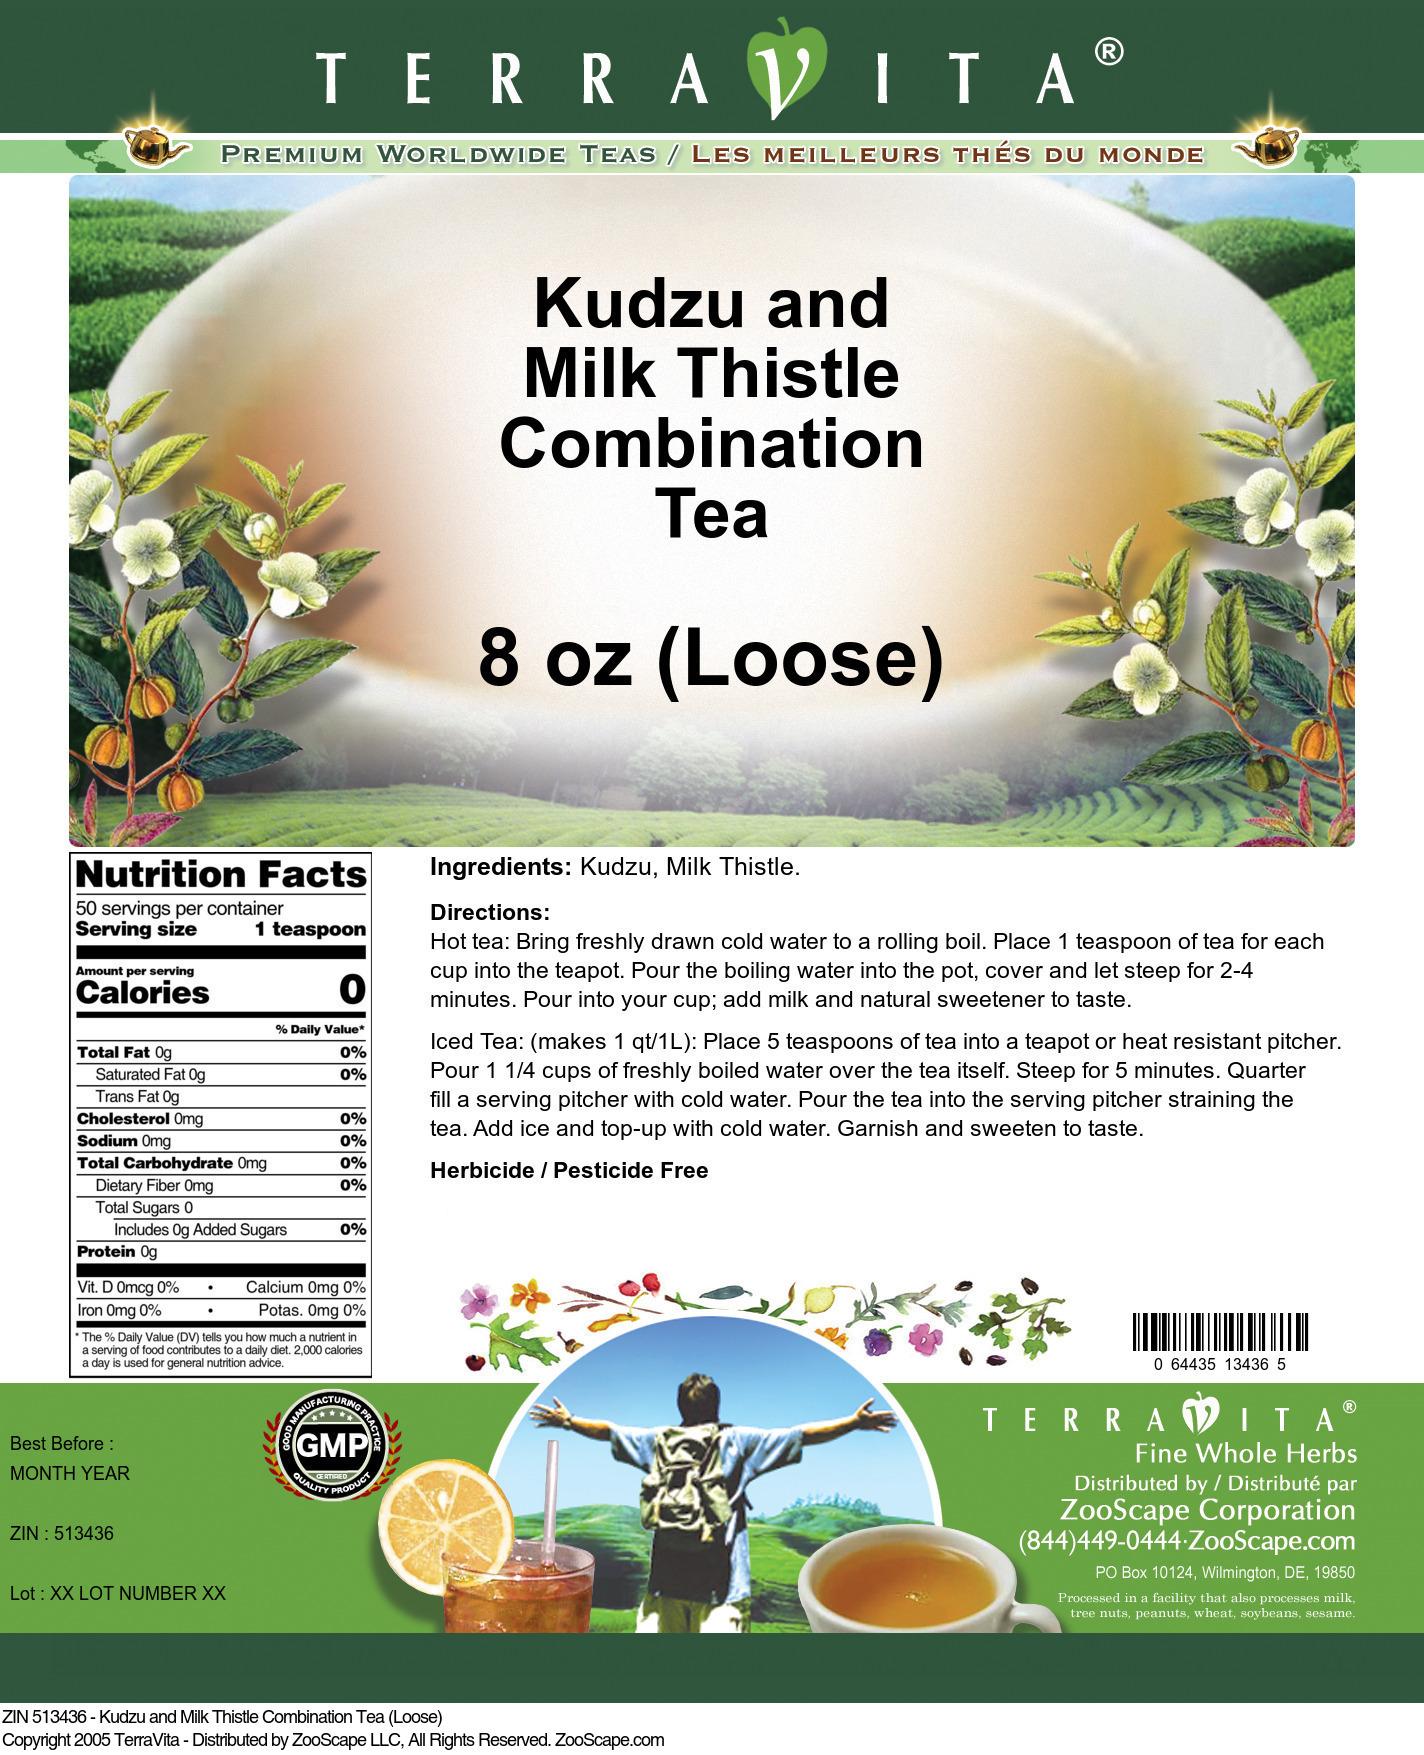 Kudzu and Milk Thistle Combination Tea (Loose)